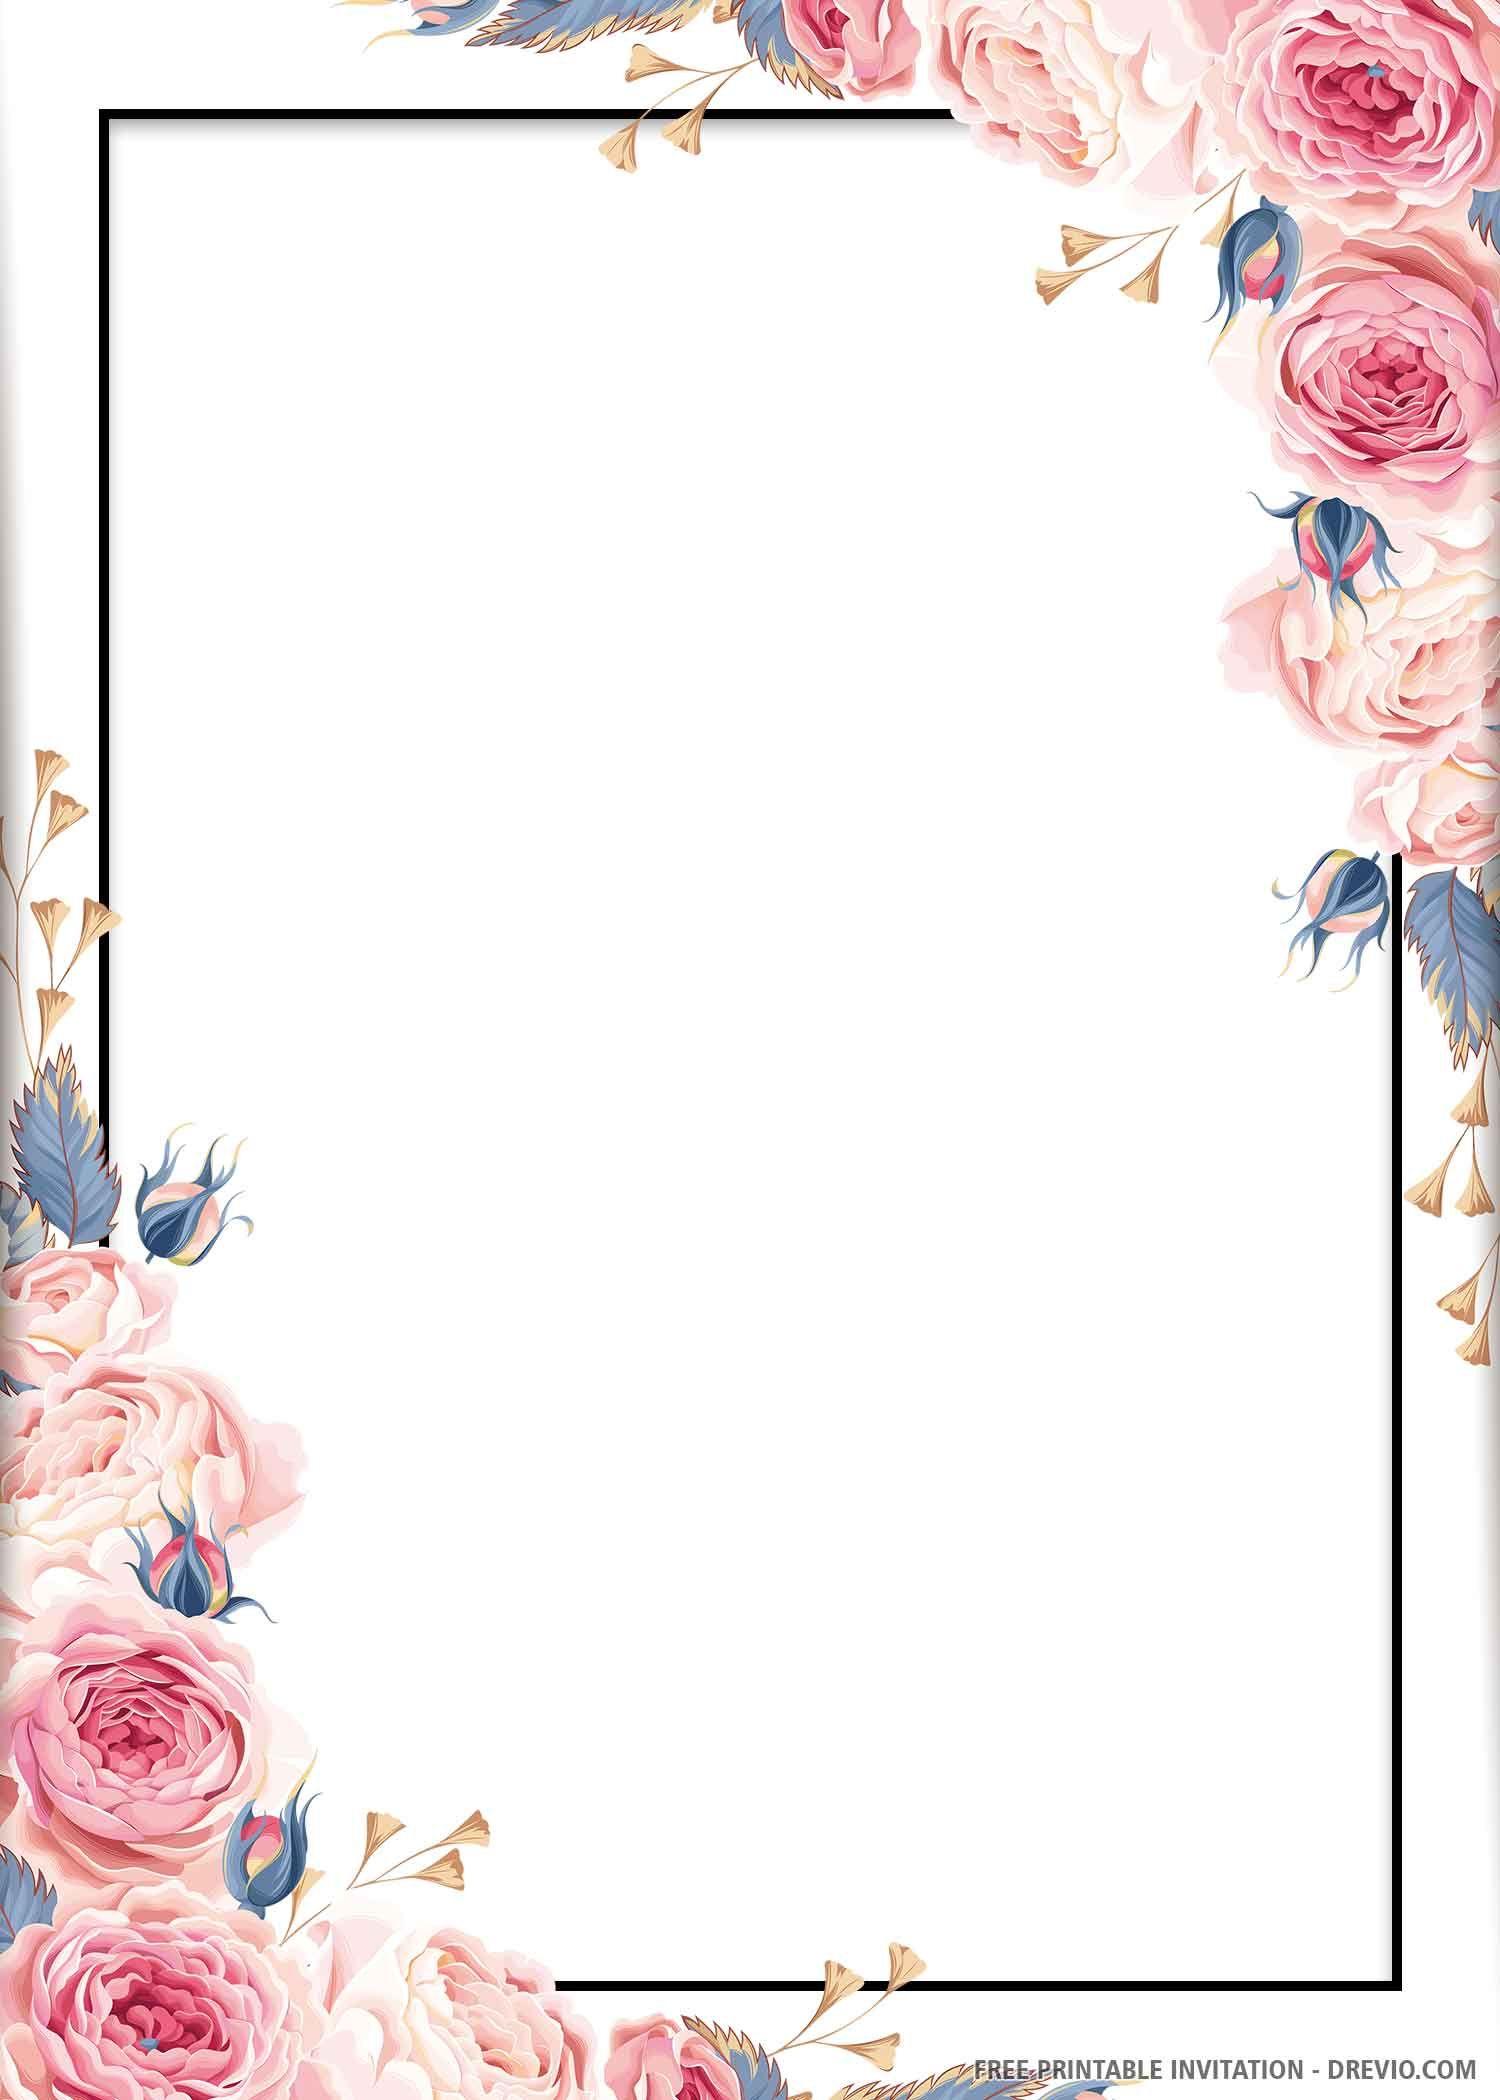 (FREE PRINTABLE) Blue Floral Wedding Invitation Template